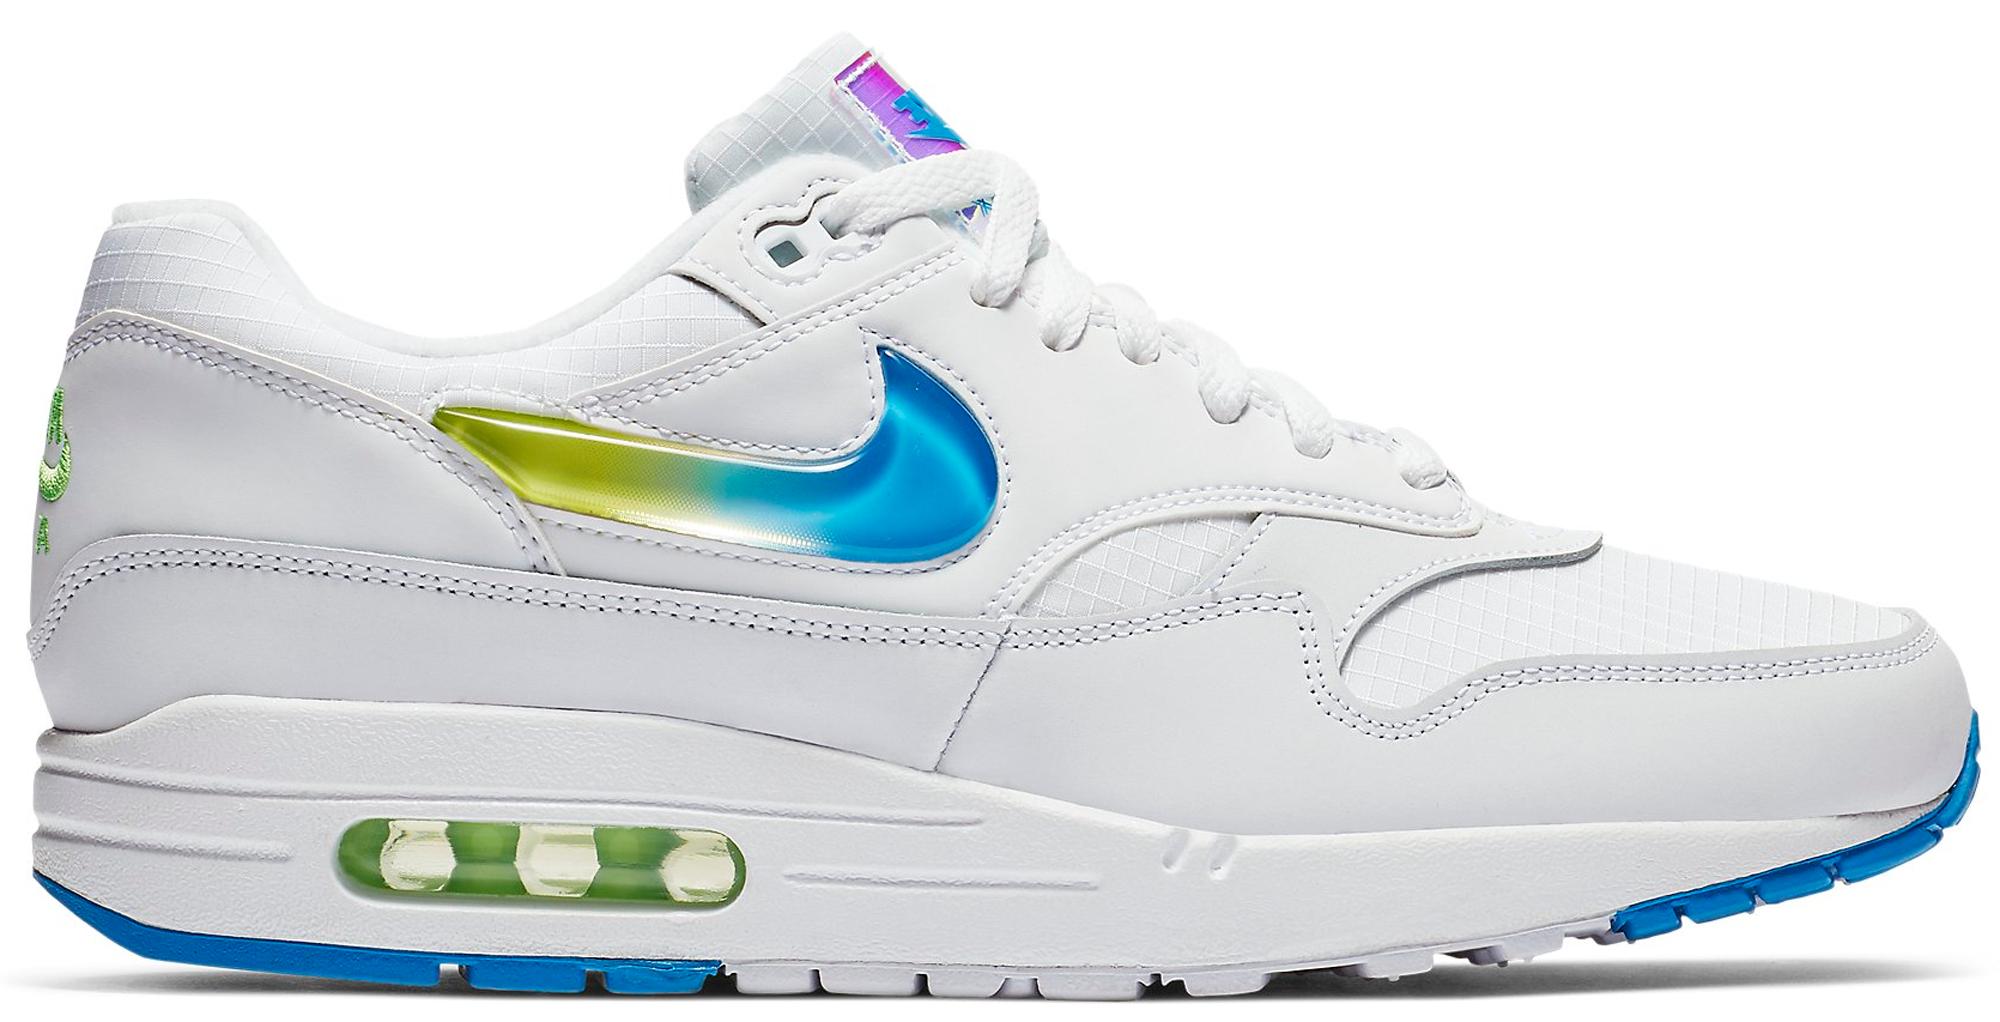 Nike Air Max 1 Jelly Jewel White